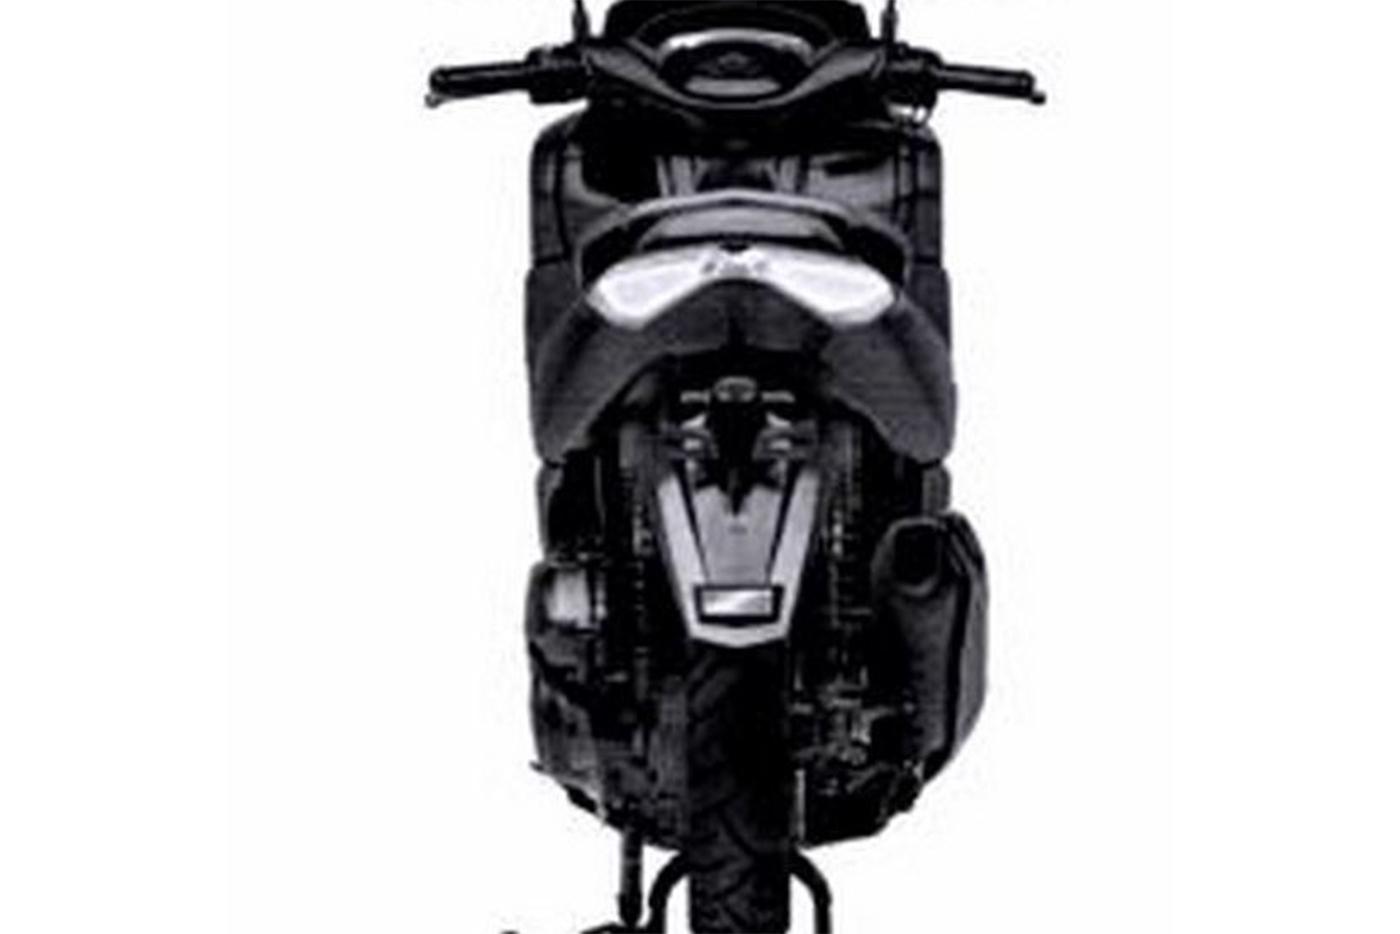 yamaha-nmaxx-155-update-rear-cbb7.jpg